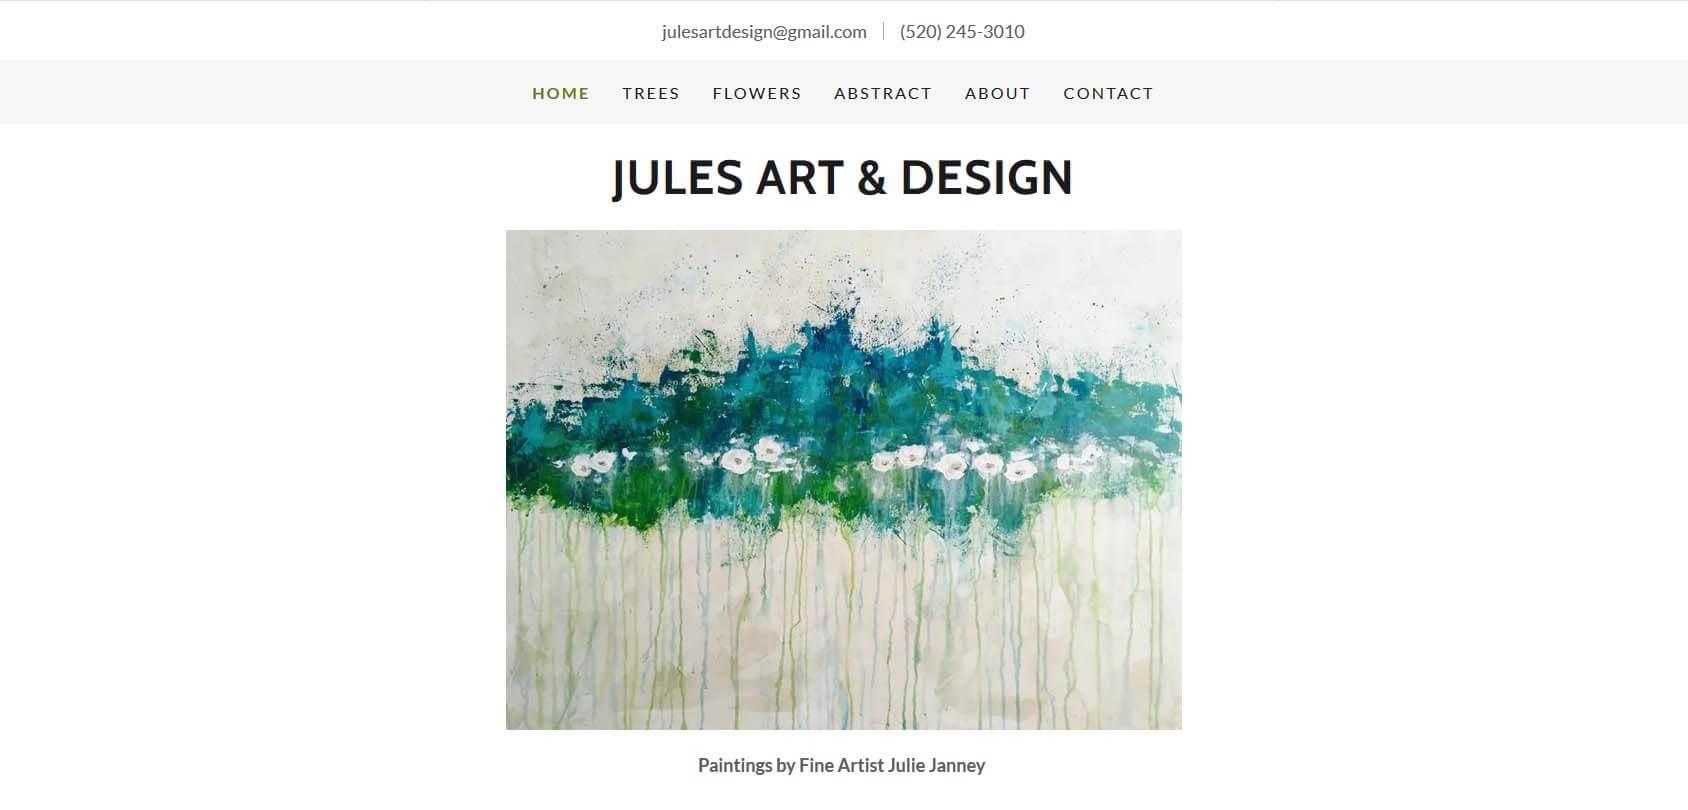 Jules Art & Design Homepage